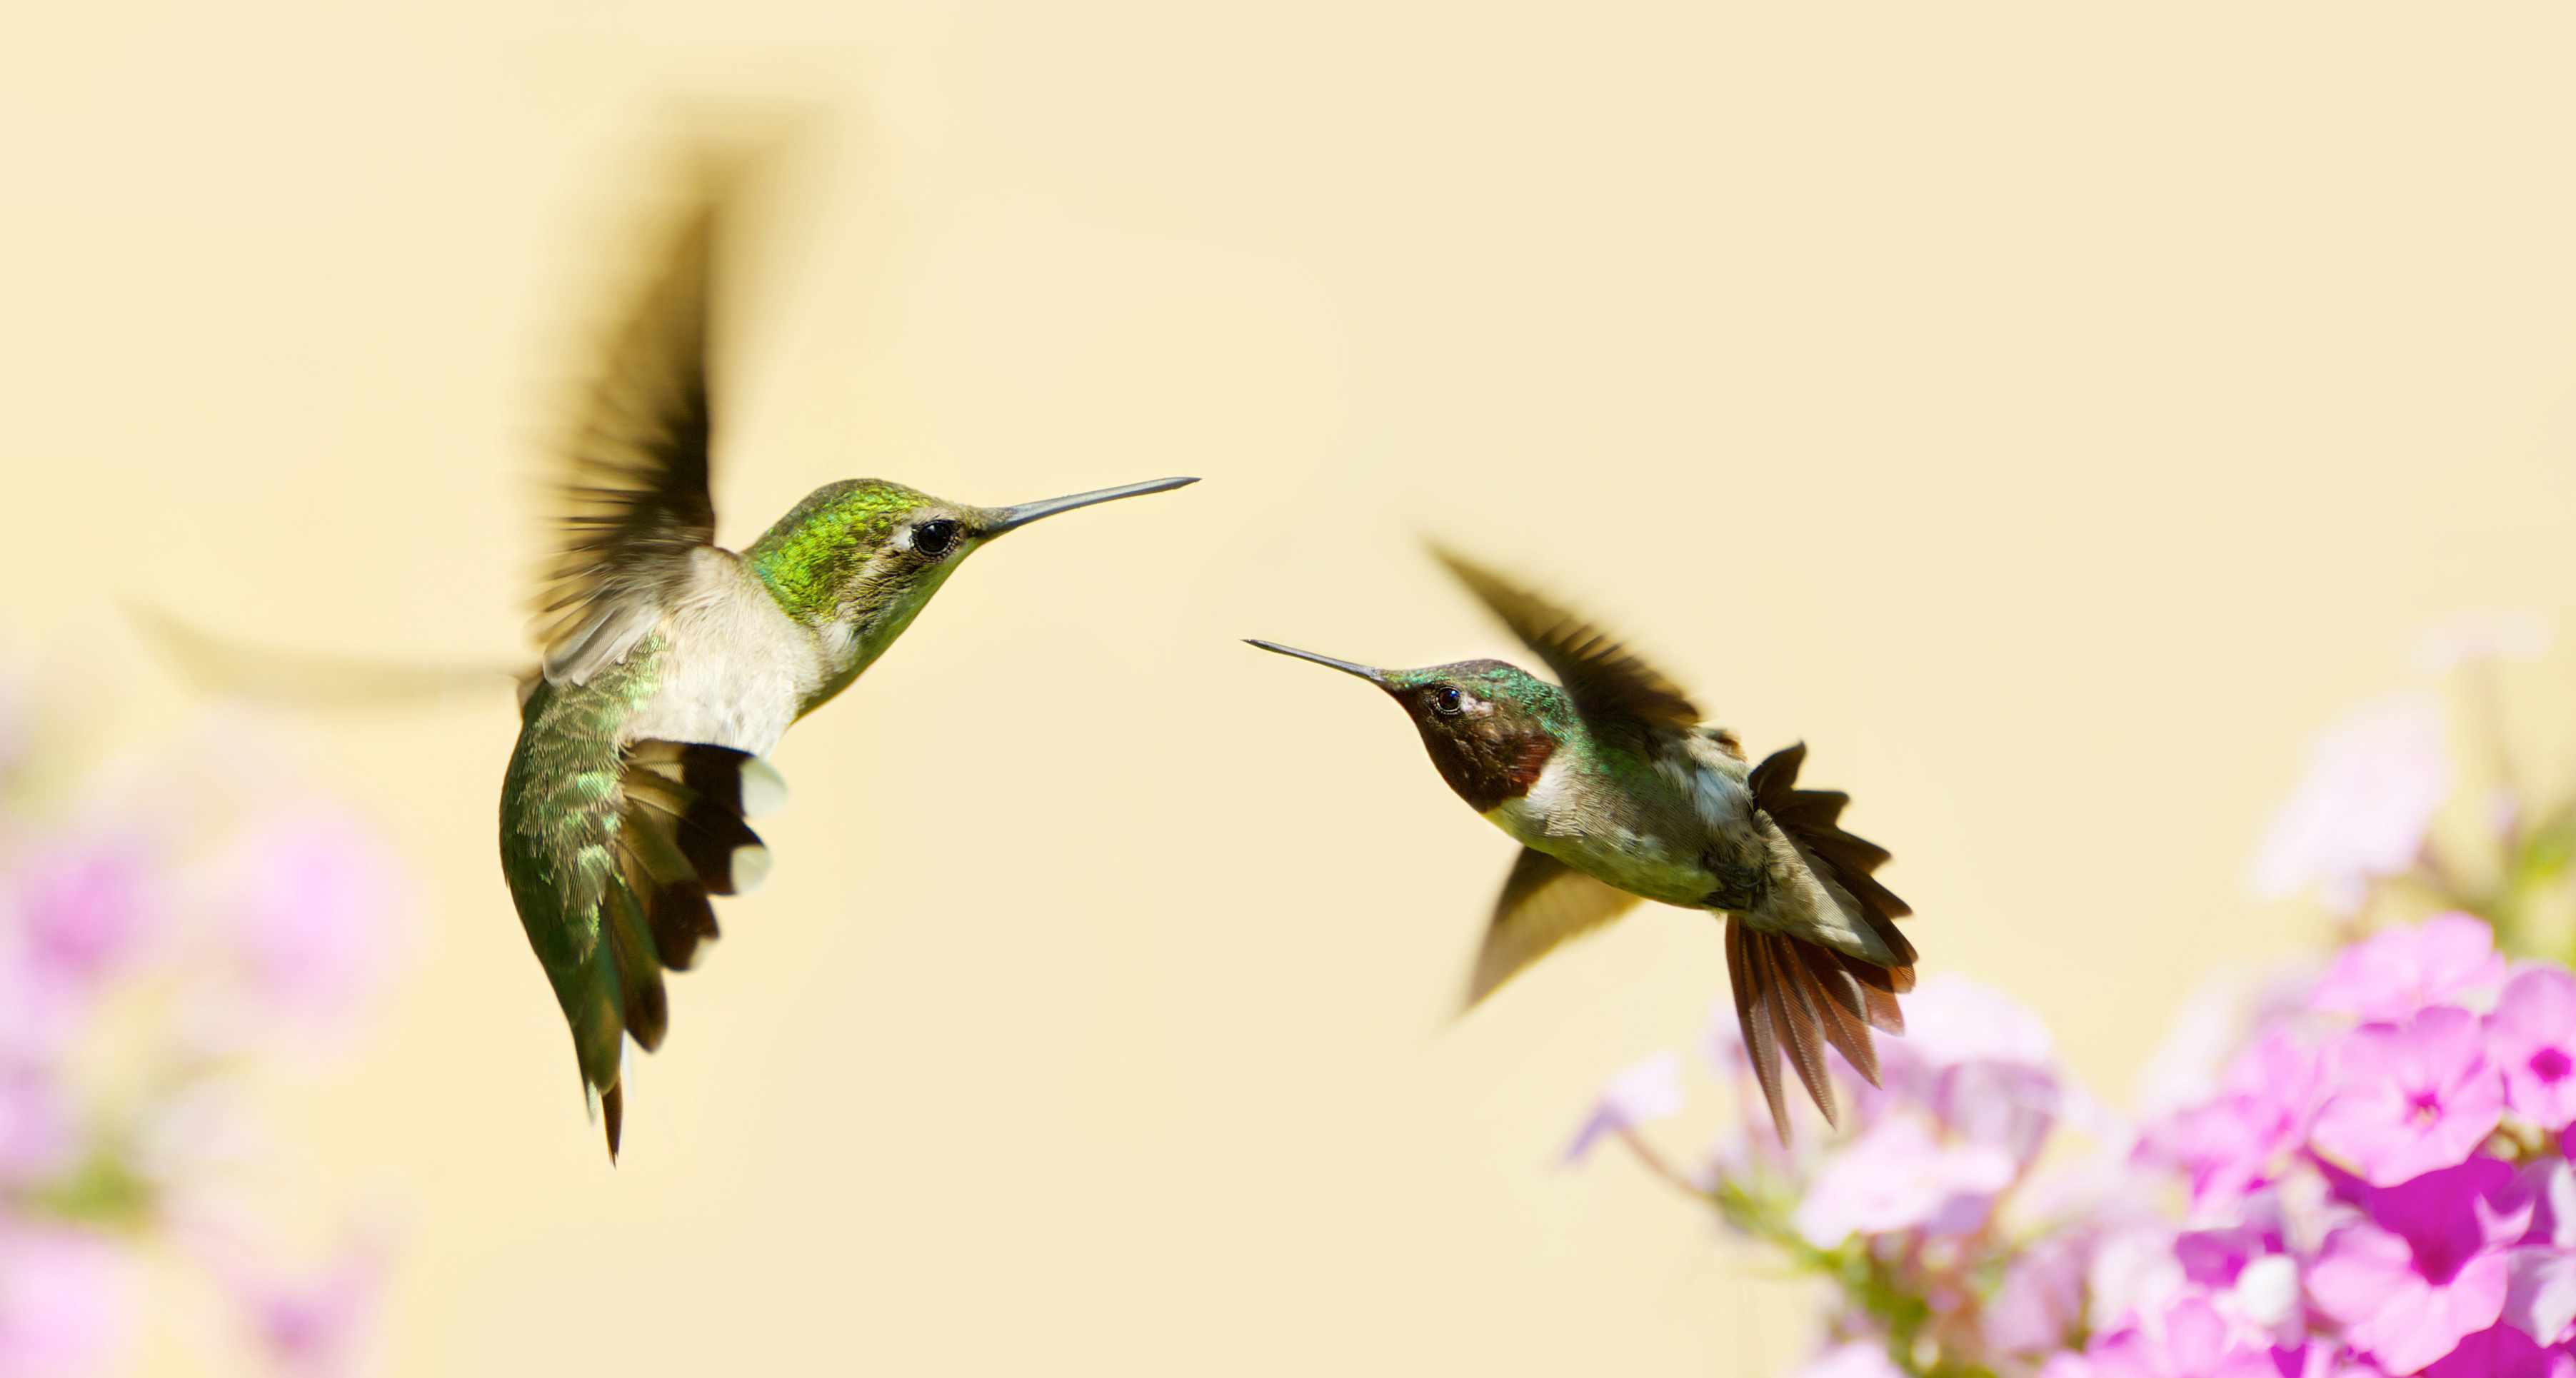 ruby-throated hummingbirds, Archilochus colubris